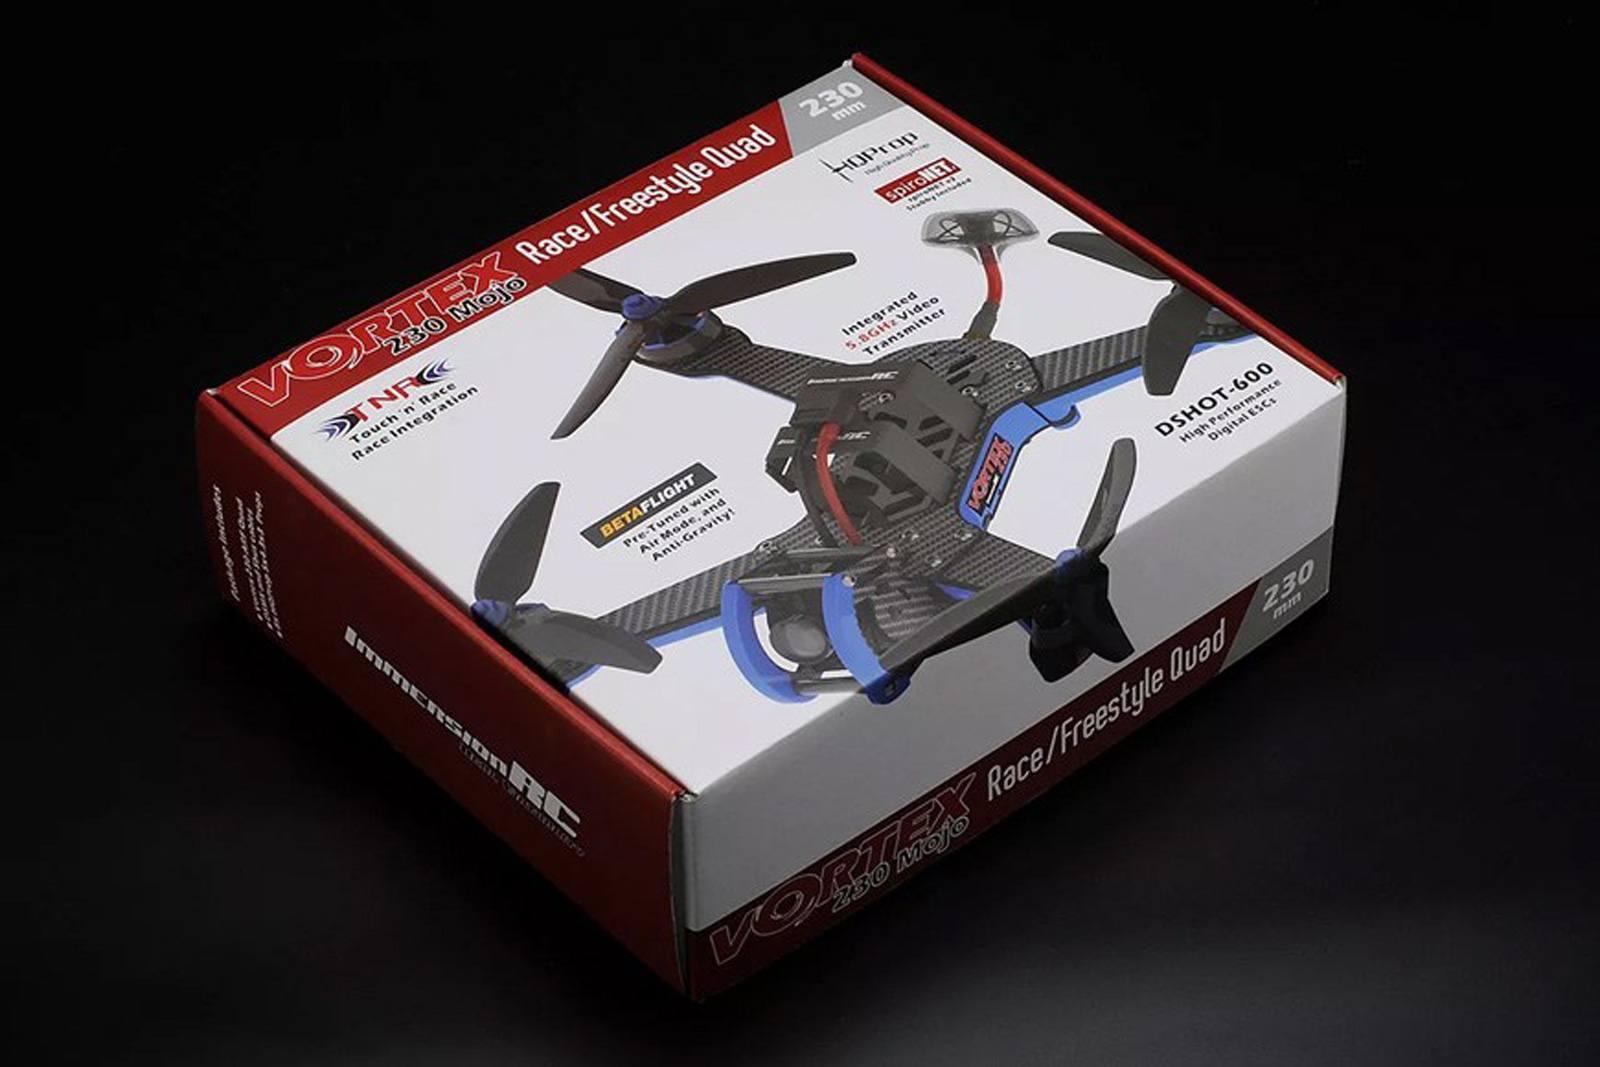 Immersion Vortex 230 Mojo Race Quadcopter